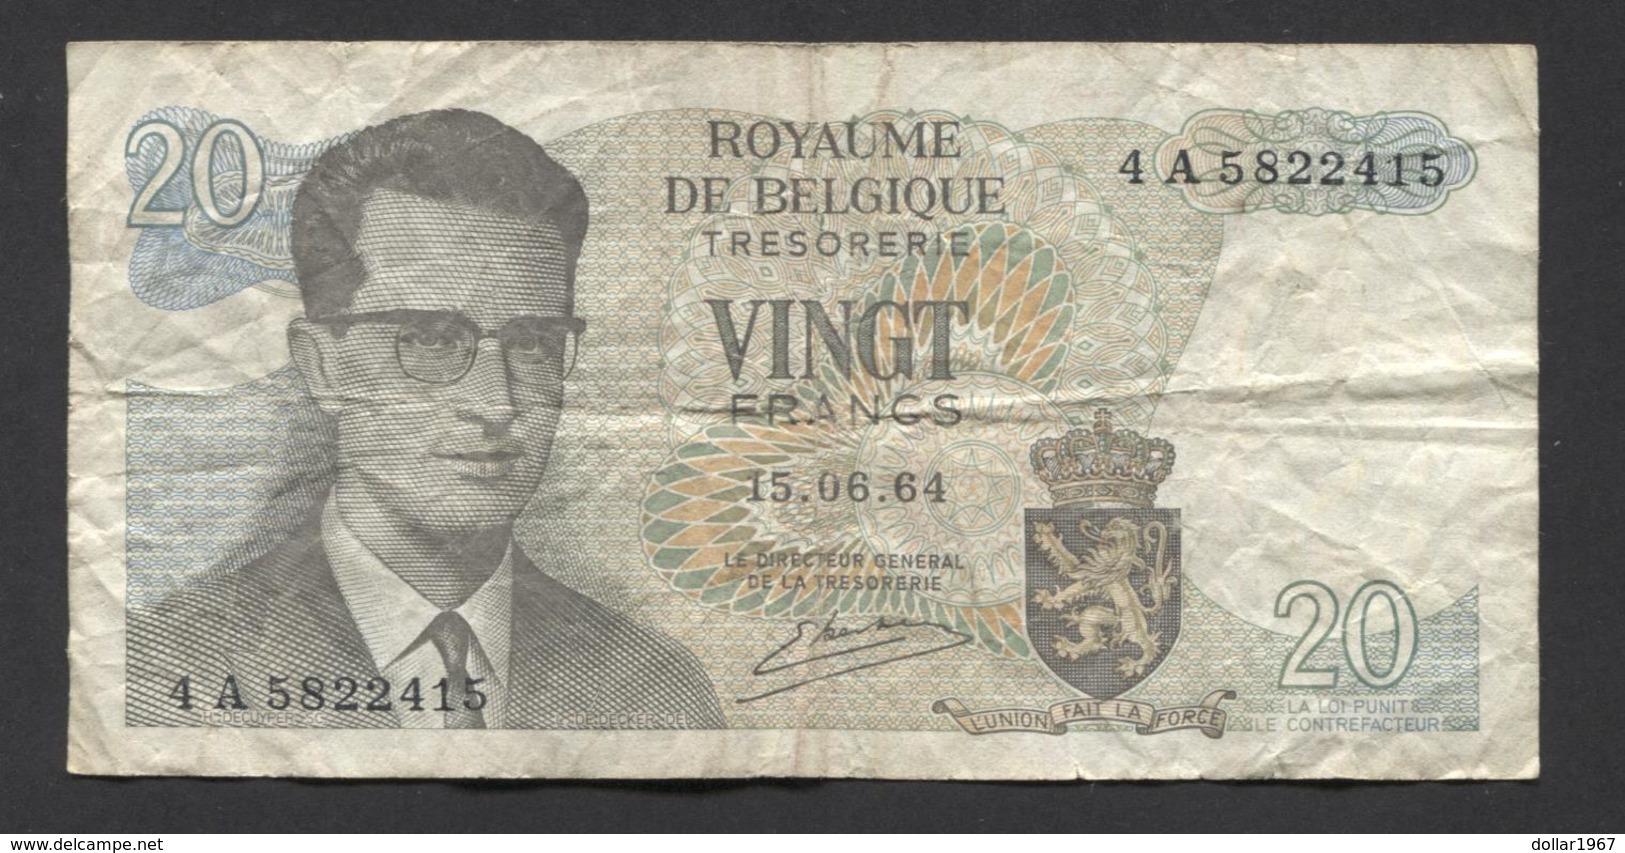 België Belgique Belgium 15 06 1964 -  20 Francs Atomium Baudouin. 4 A 5822415 - [ 6] Treasury